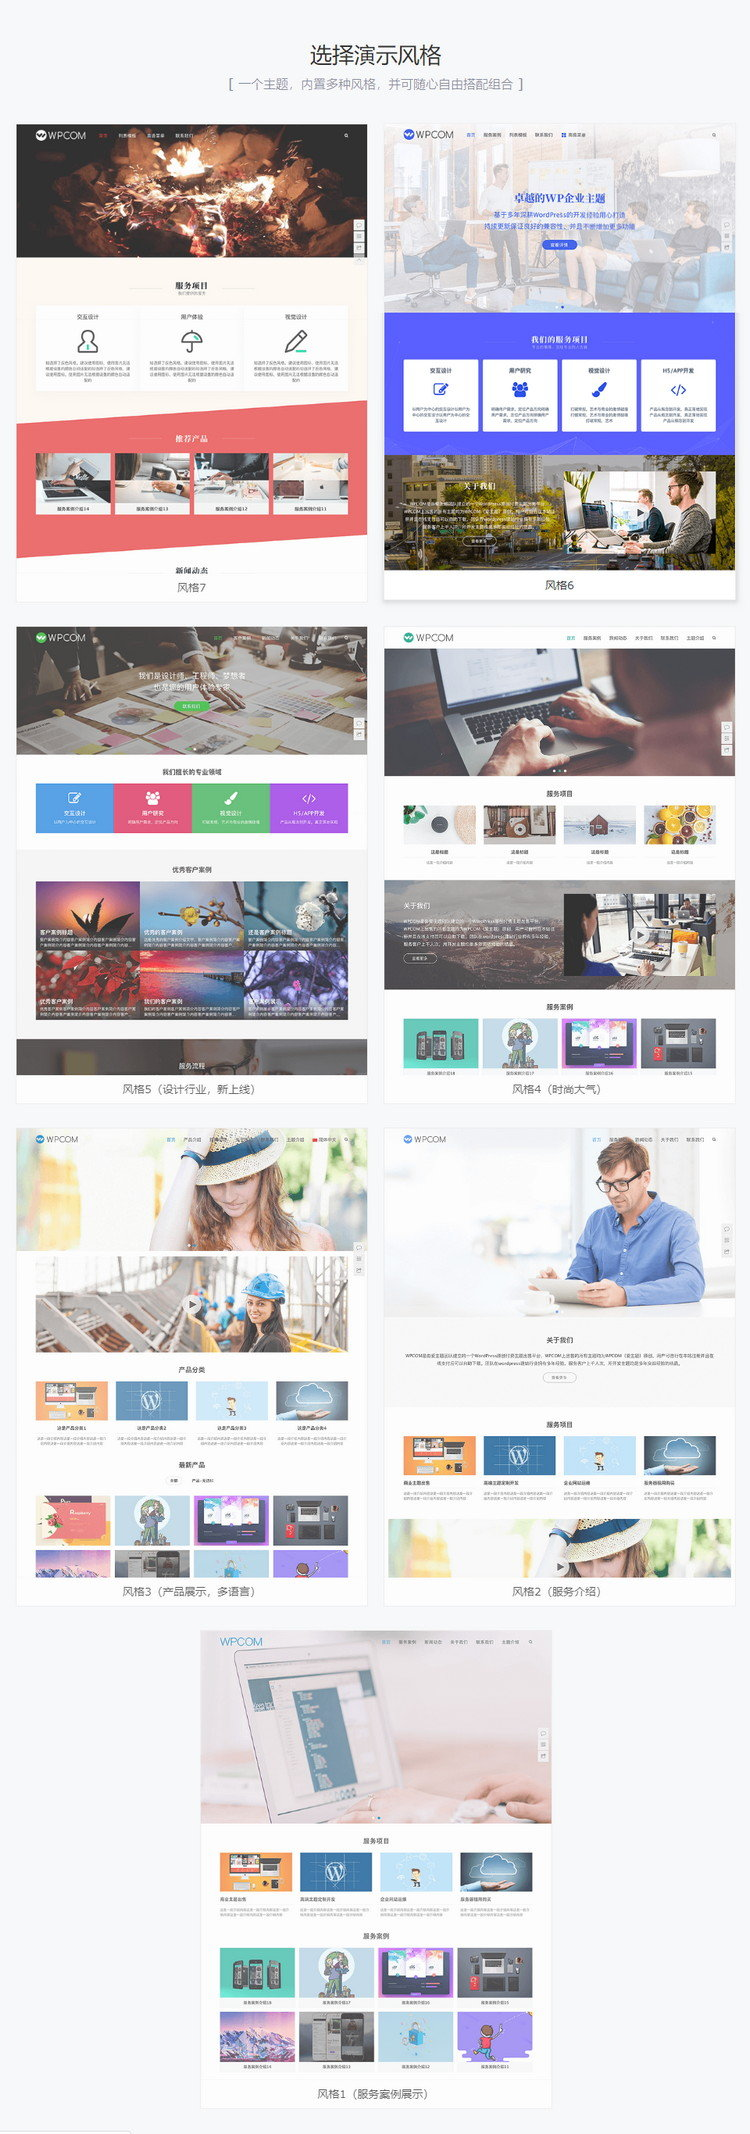 WordPress企业主题Module,支持7种风格样式的WordPress主题